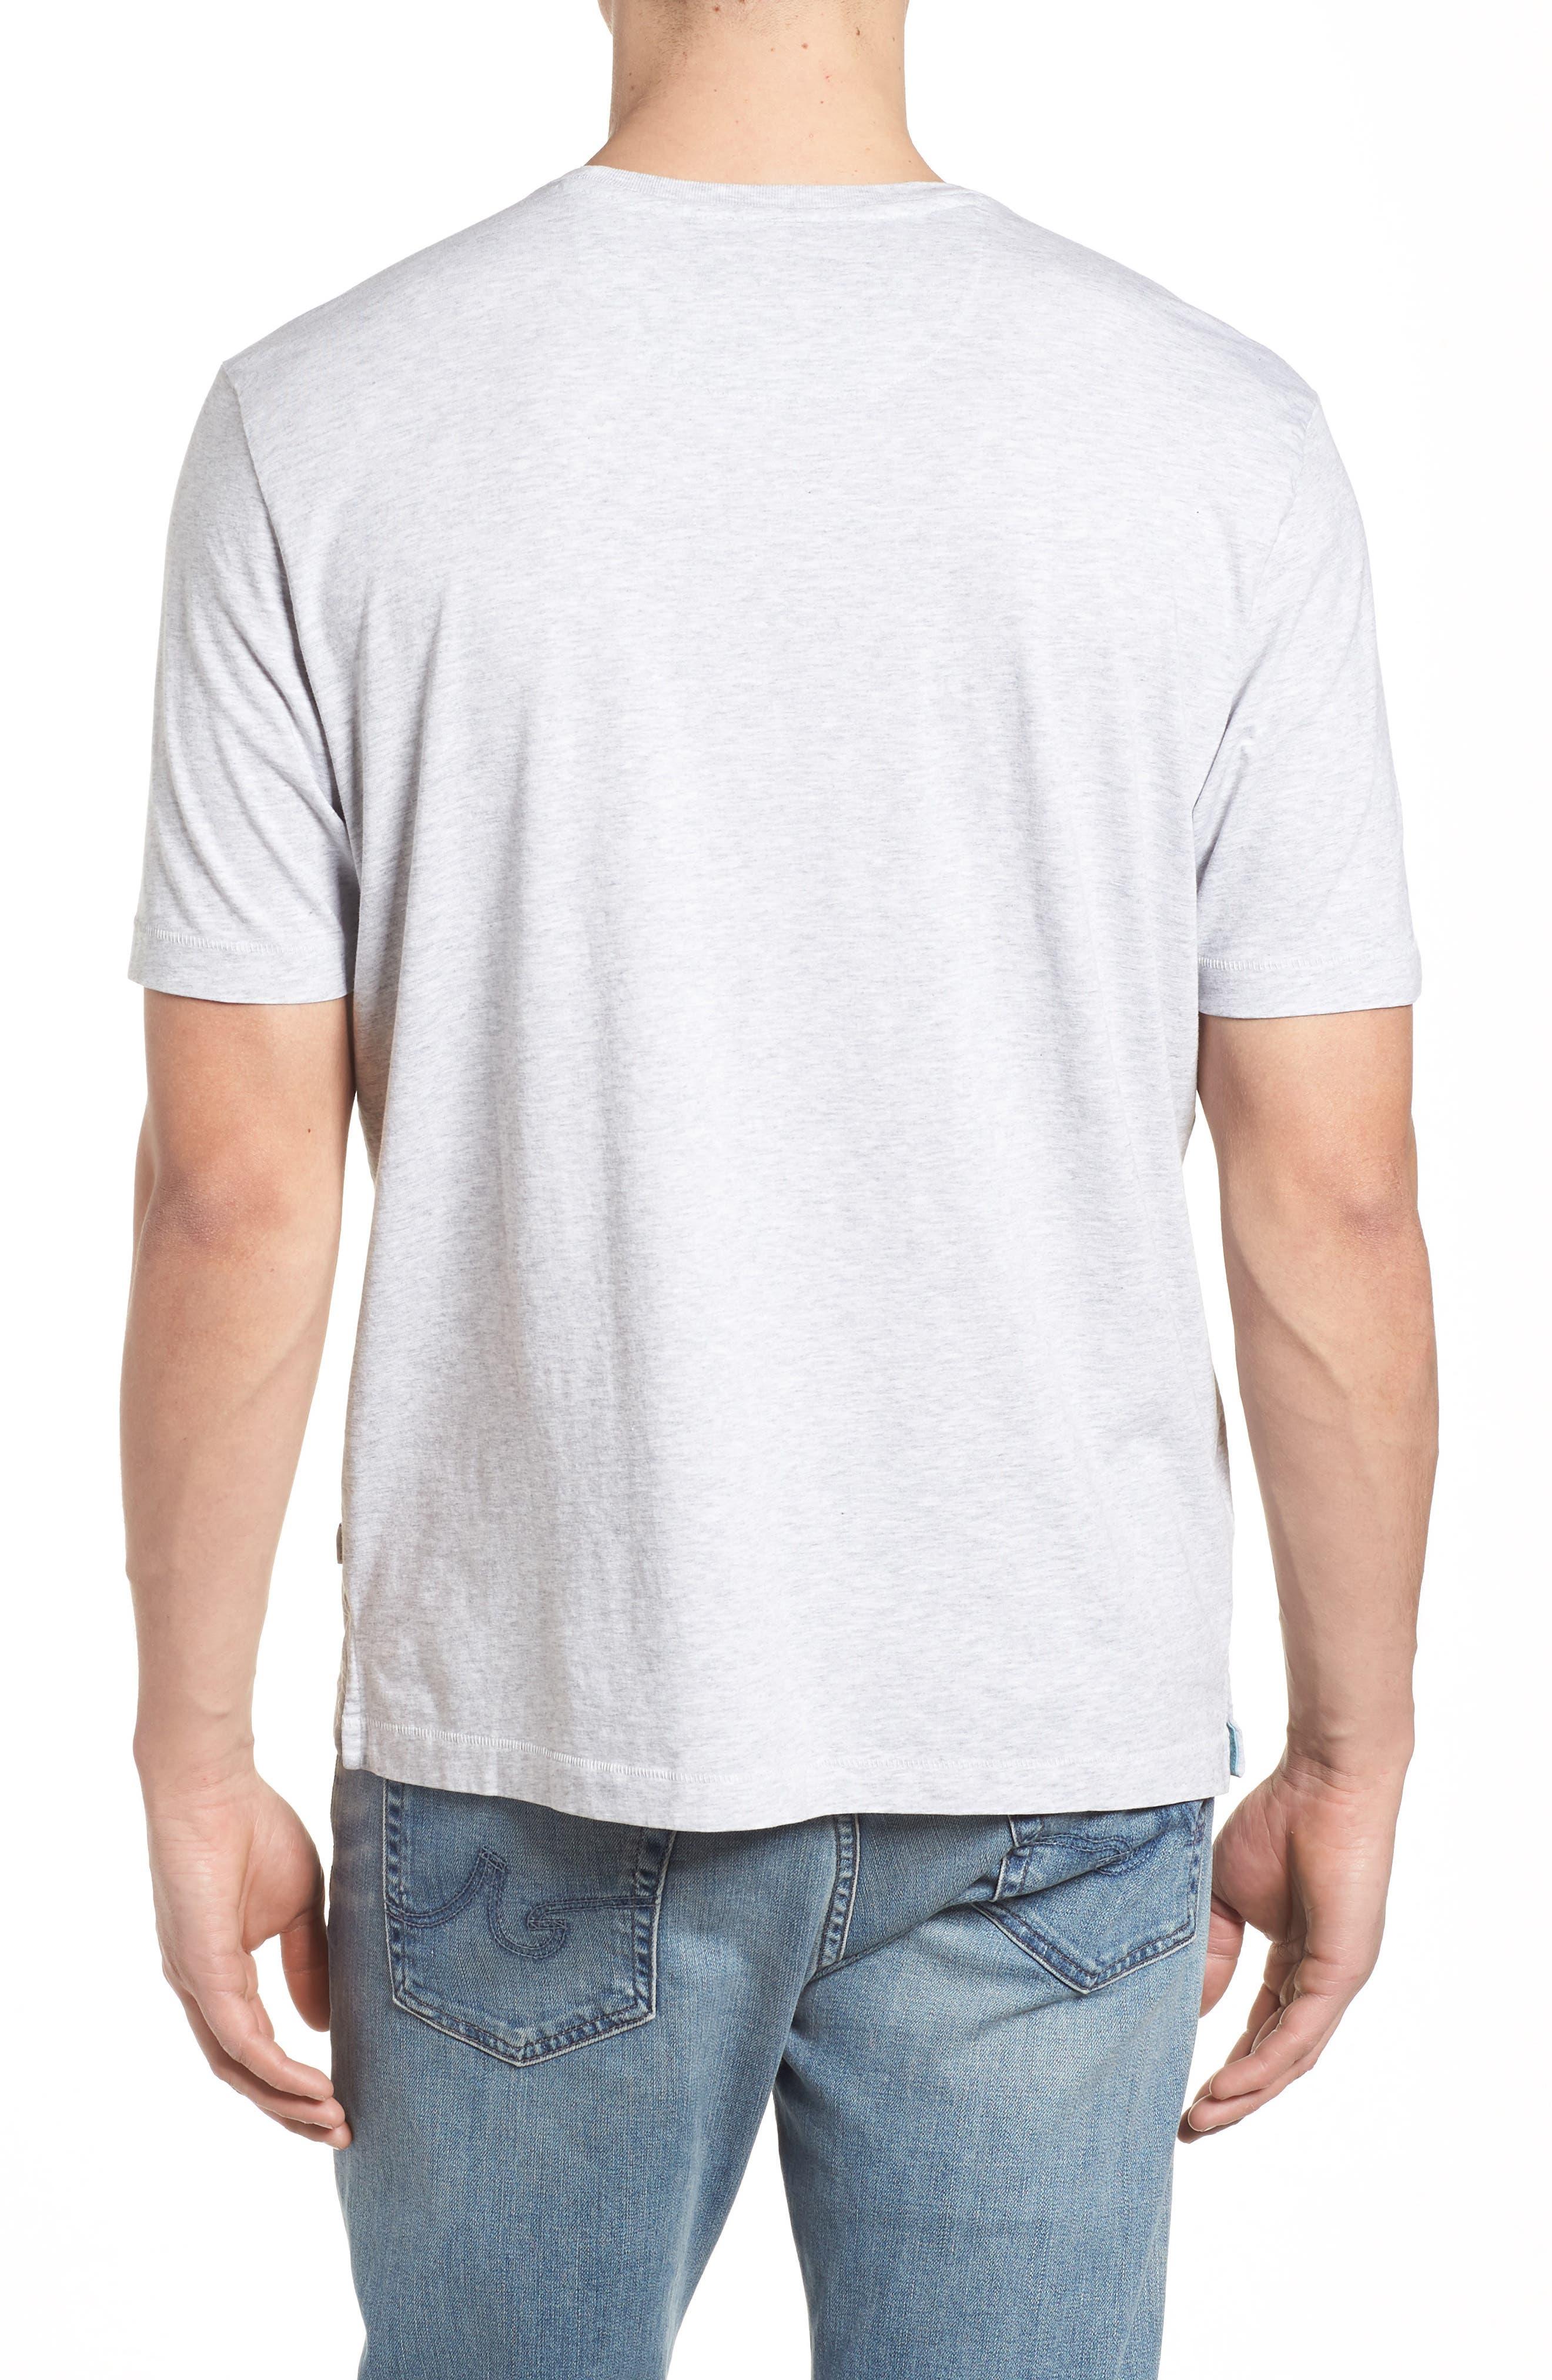 New Bali Skyline T-Shirt,                             Alternate thumbnail 2, color,                             Zinc Gray Heather